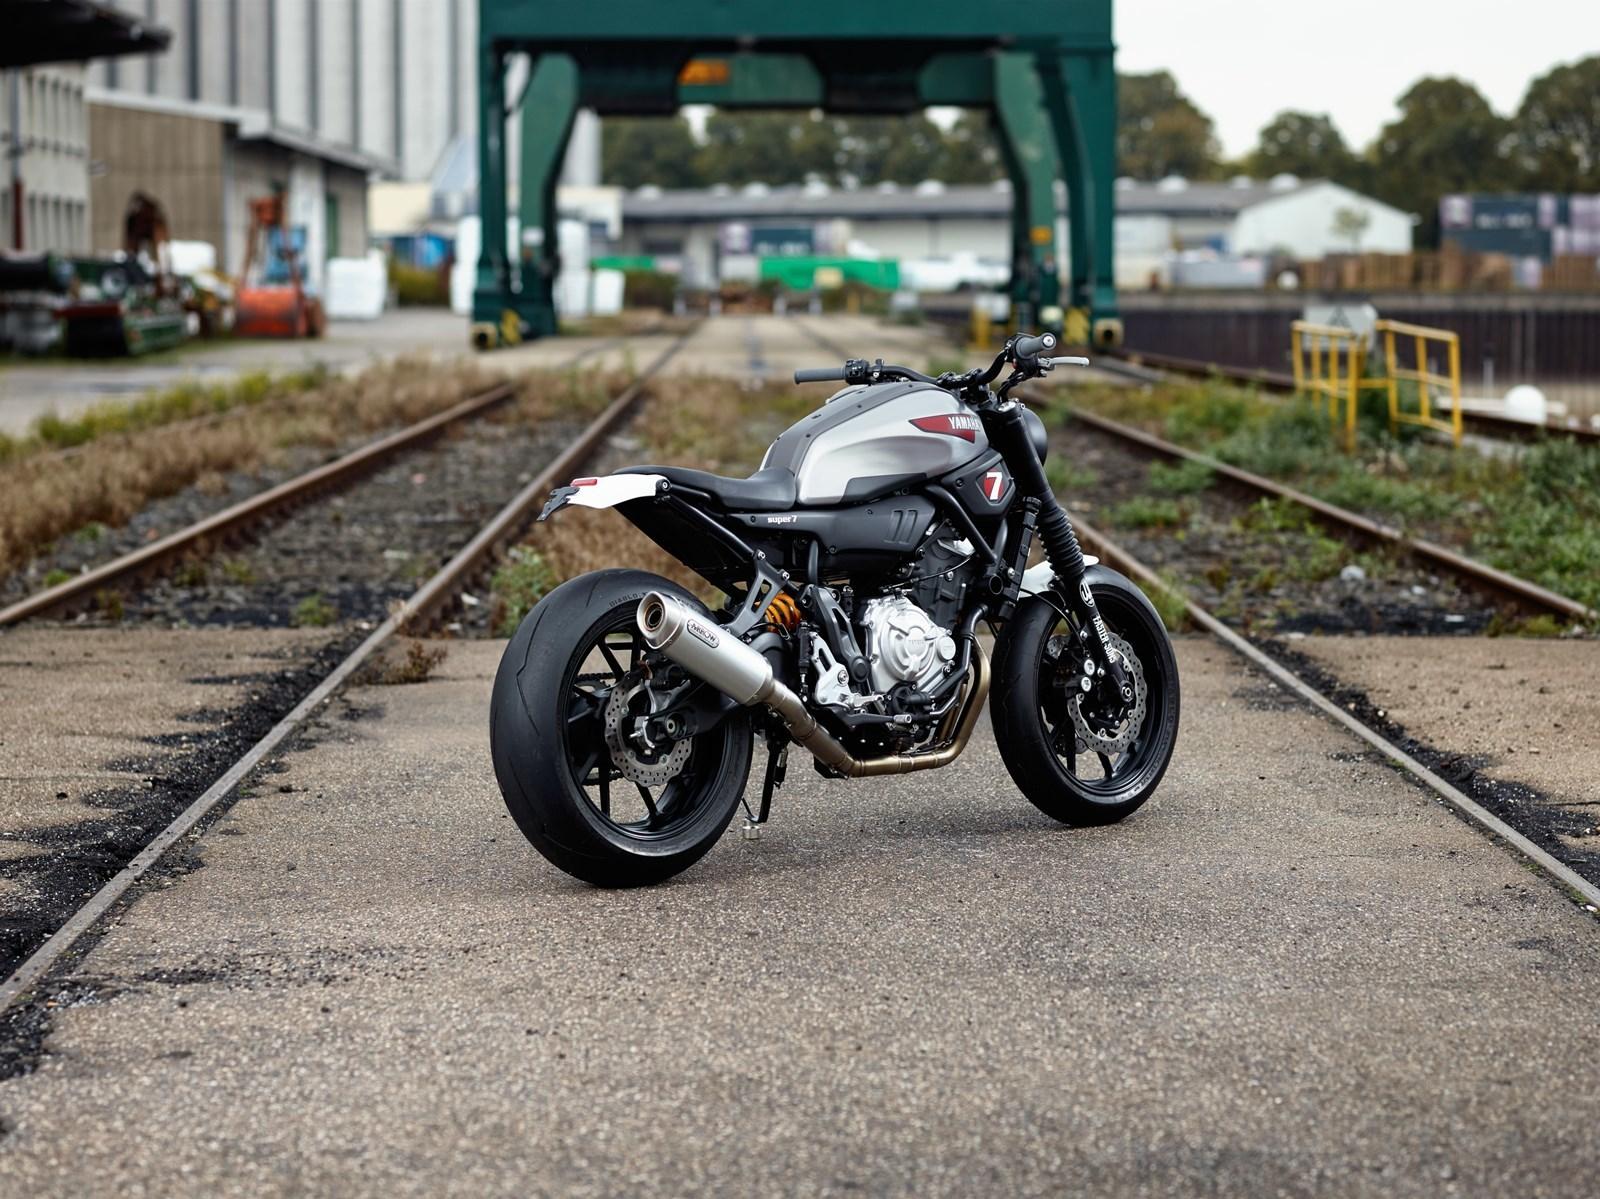 Foto de Yamaha XSR700 Super 7 by JvB-Moto (15/25)